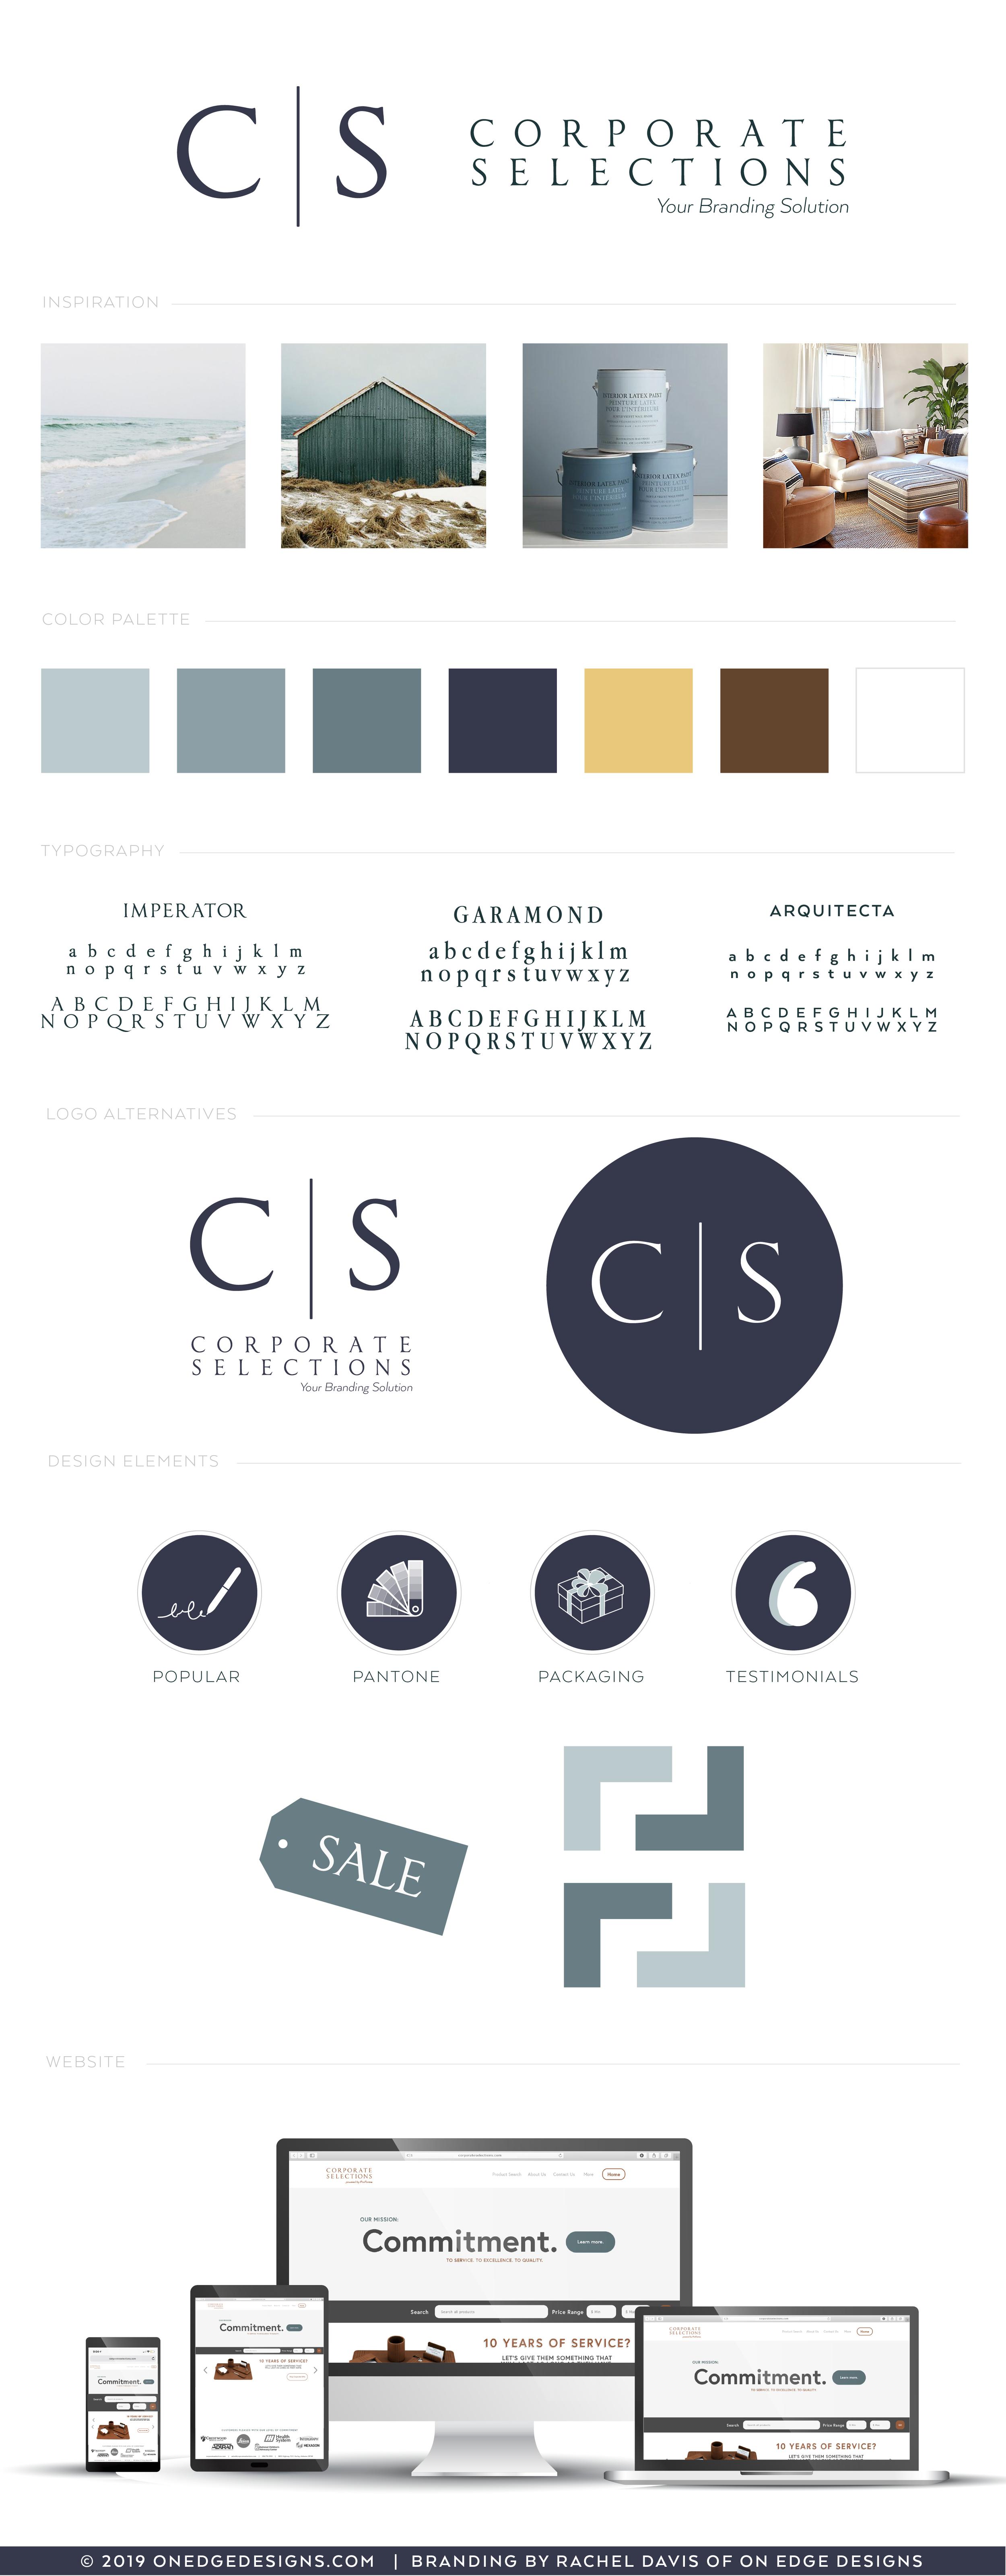 CS-branding-board-final-01.png